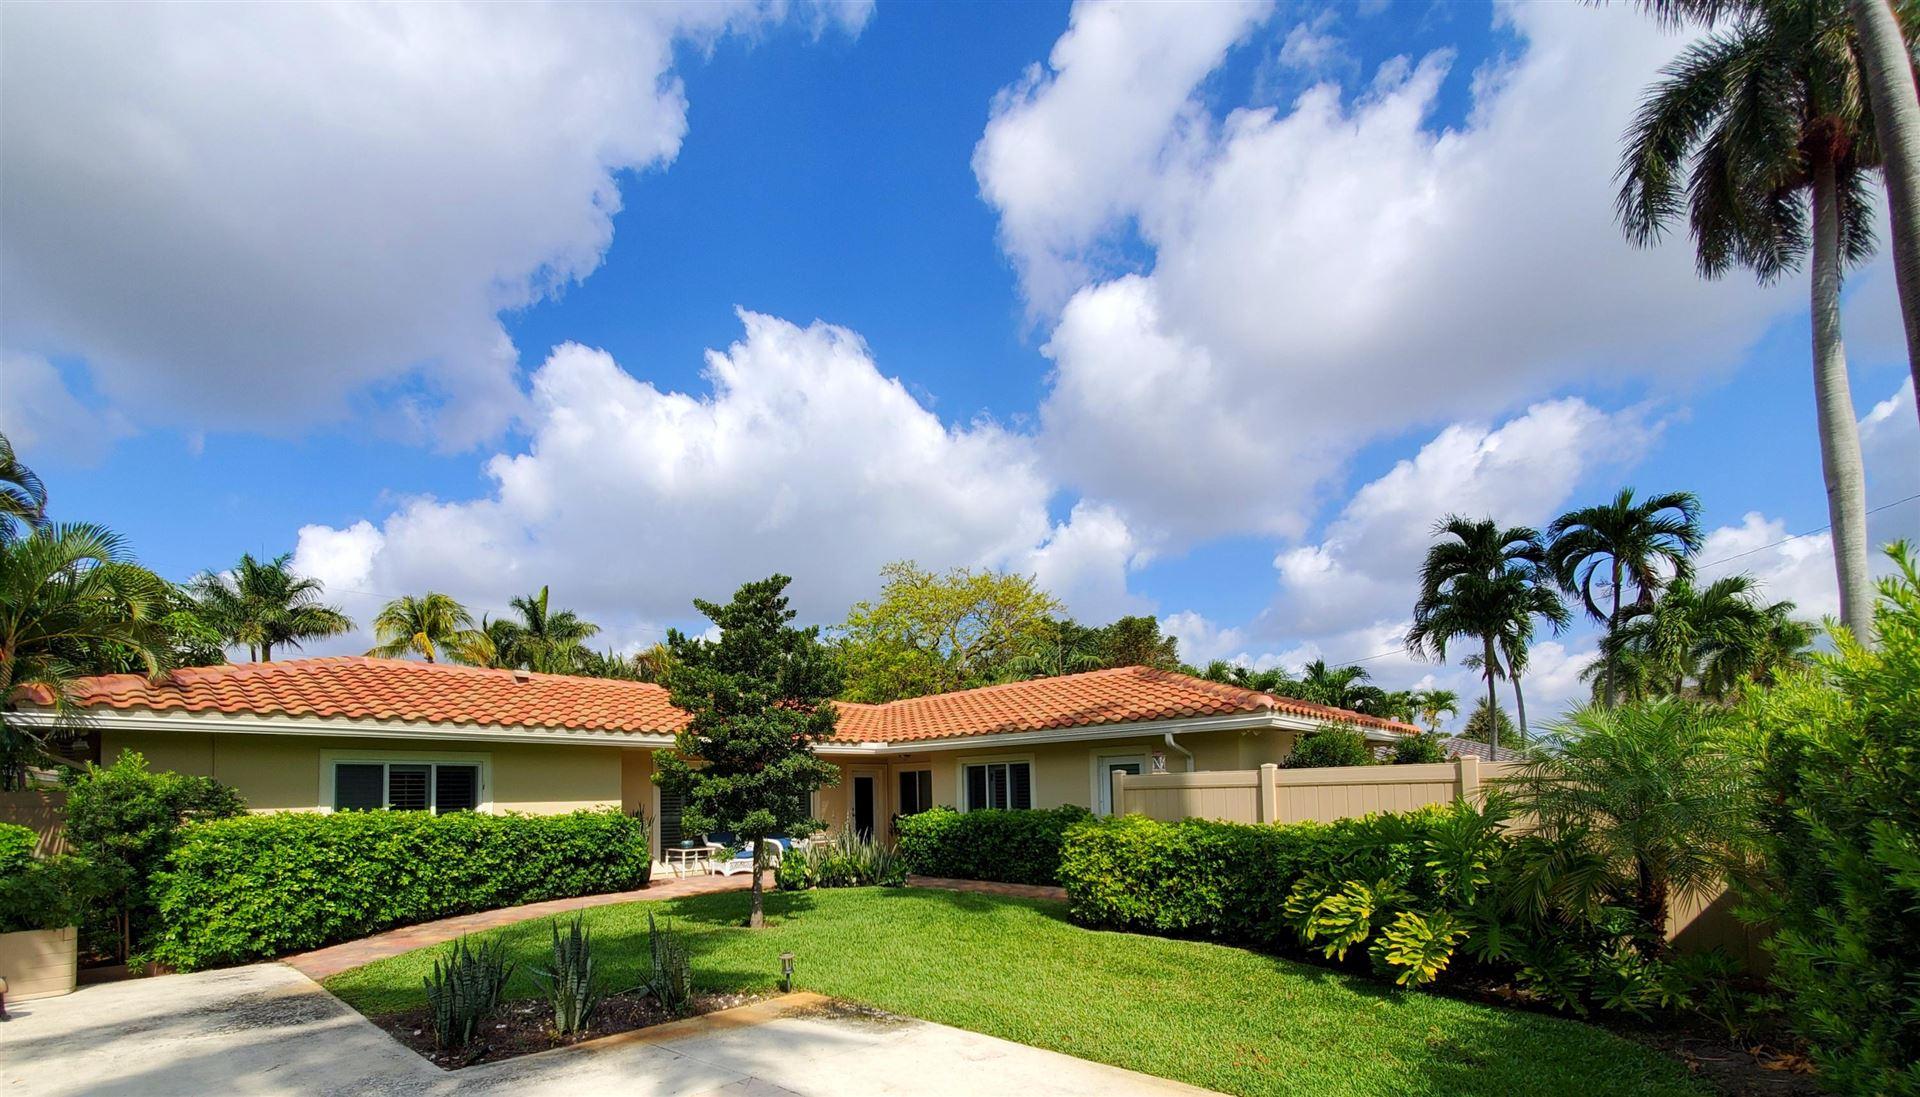 2409 NE 26 Avenue NE, Fort Lauderdale, FL 33305 - #: RX-10635654